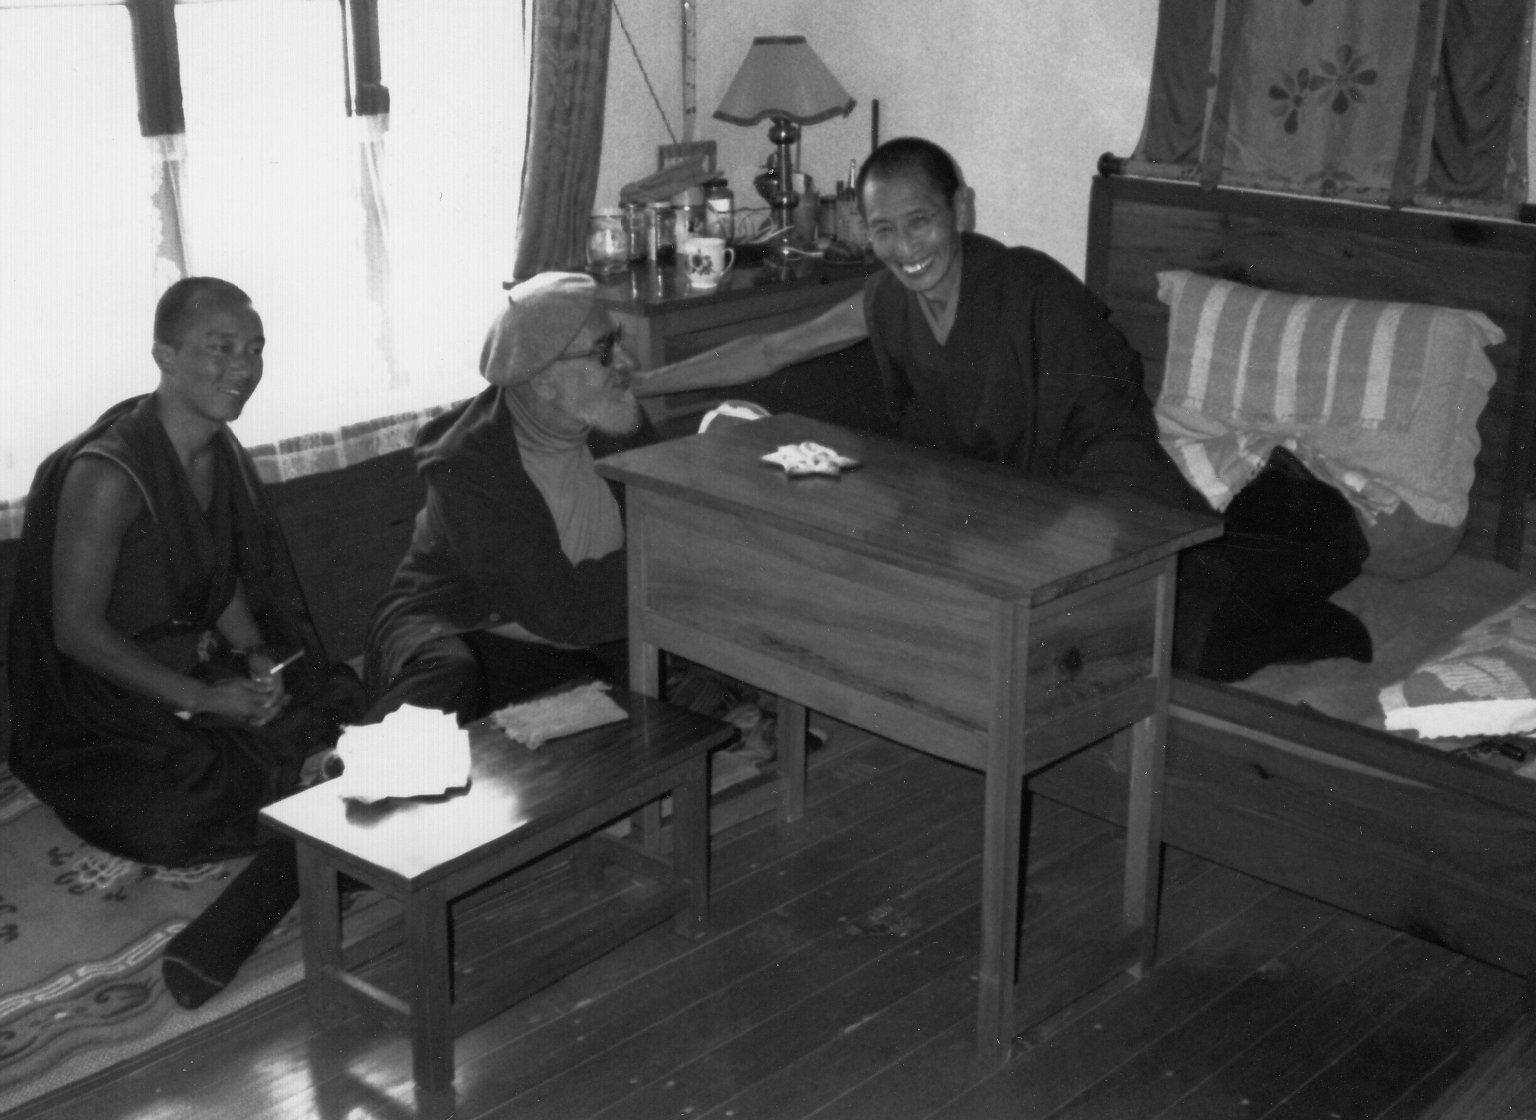 Rabbi Zalman Schachter-Shalomi with a Tibetan Buddhist geshe, possibly Geshe Kelsang Gyatso, Fall 1990.